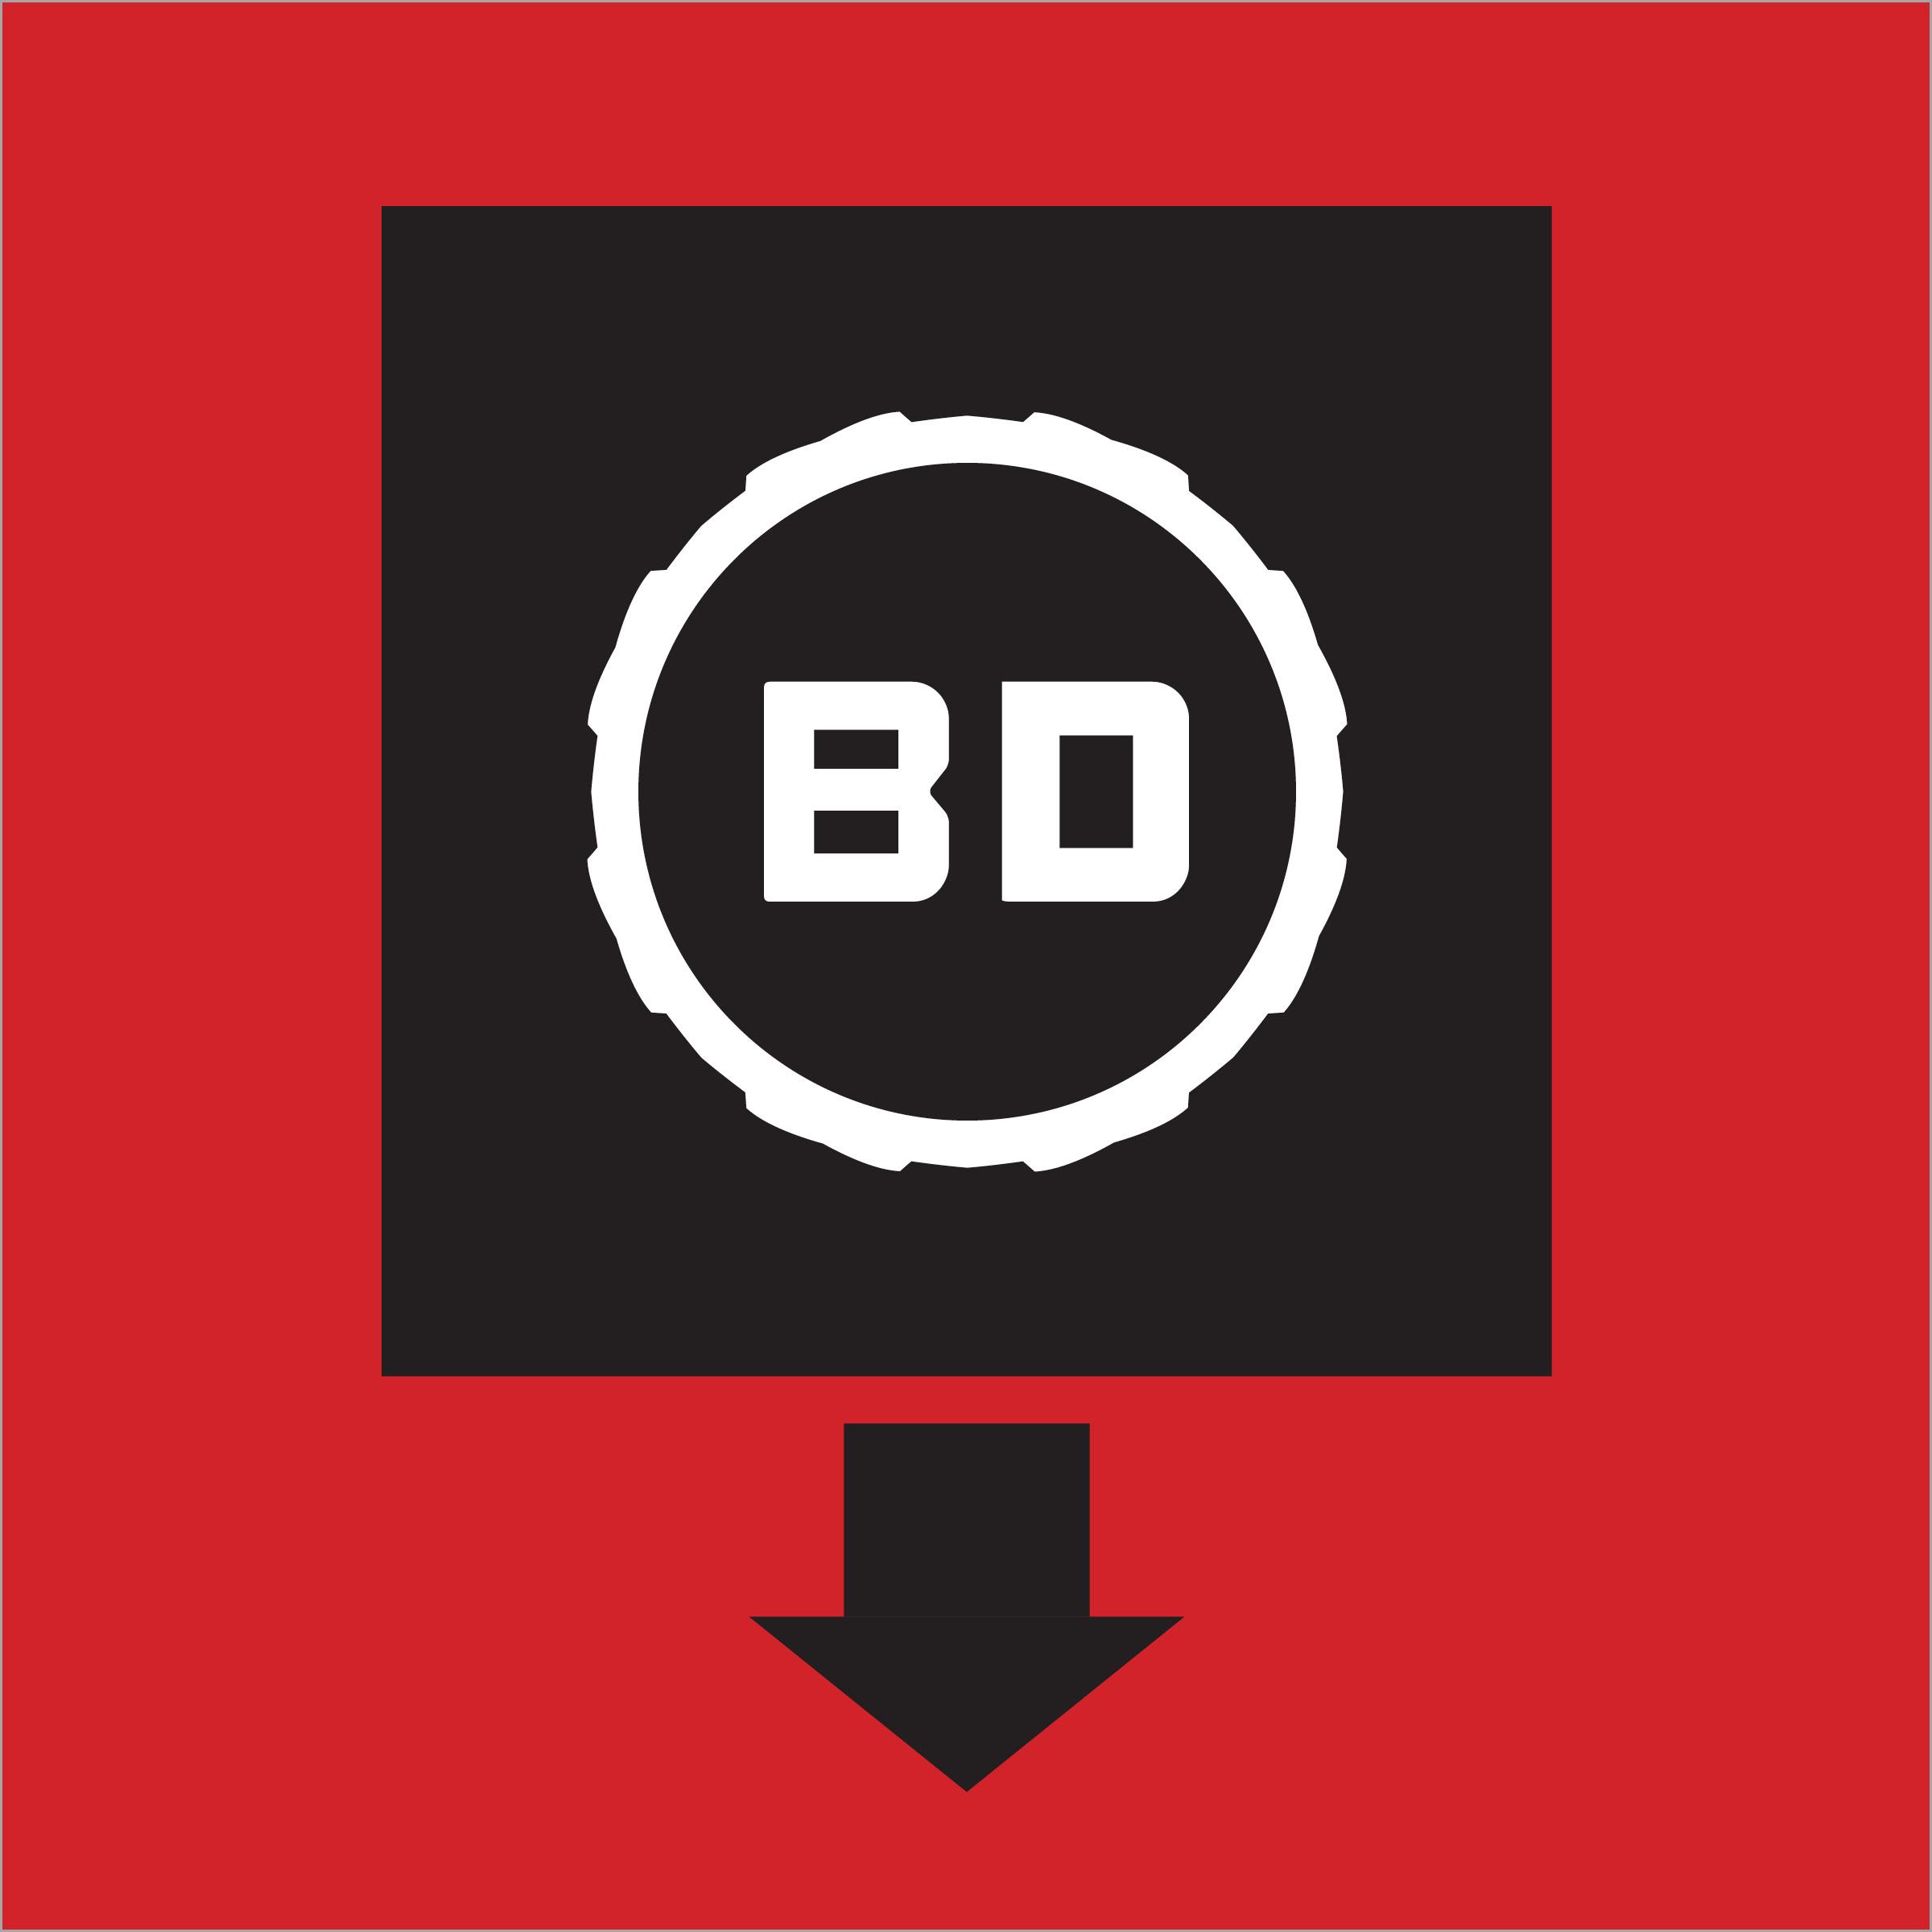 BTD-preorderPgPackageIcons-AlbumArt2400x-Final-Dnload.jpeg